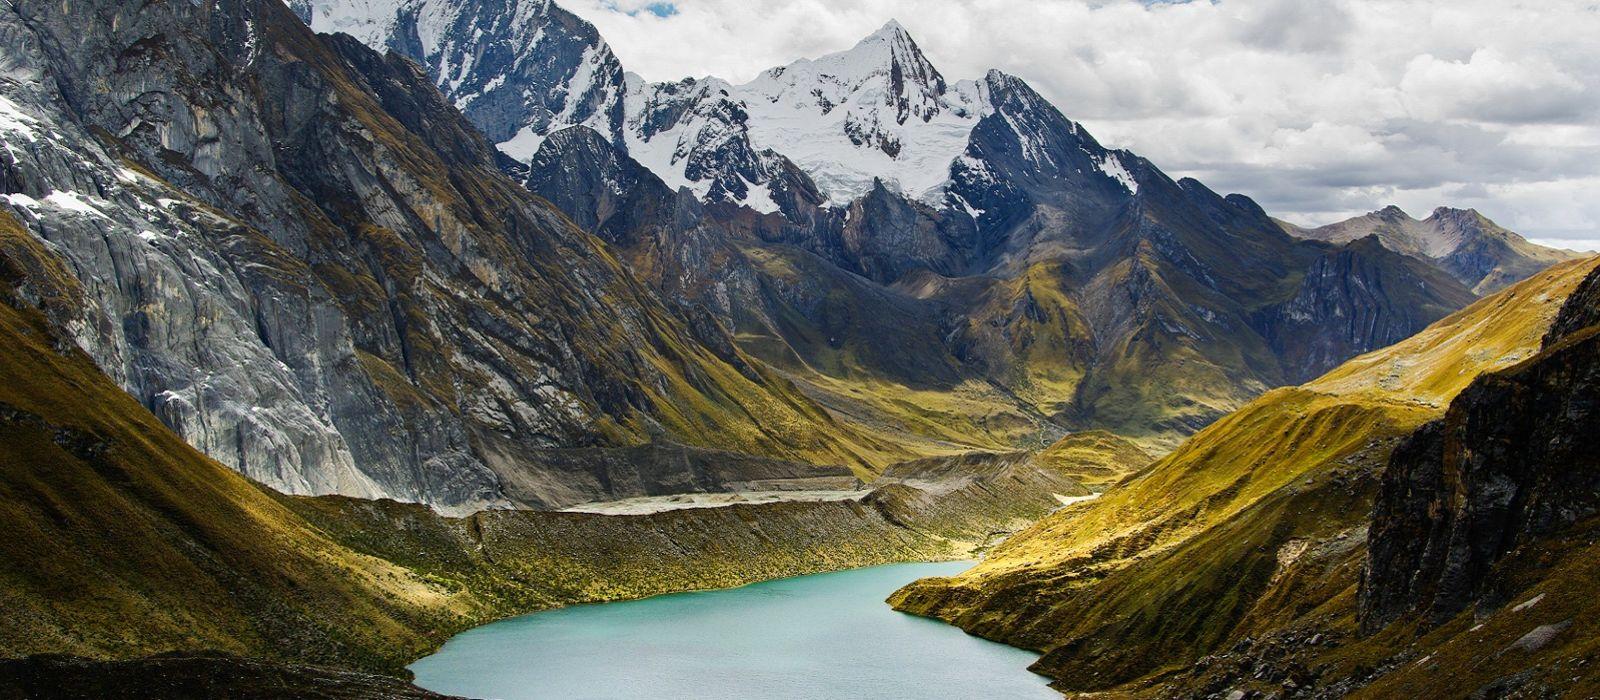 Peru: Luxury Honeymoon and Beach Tour Trip 6